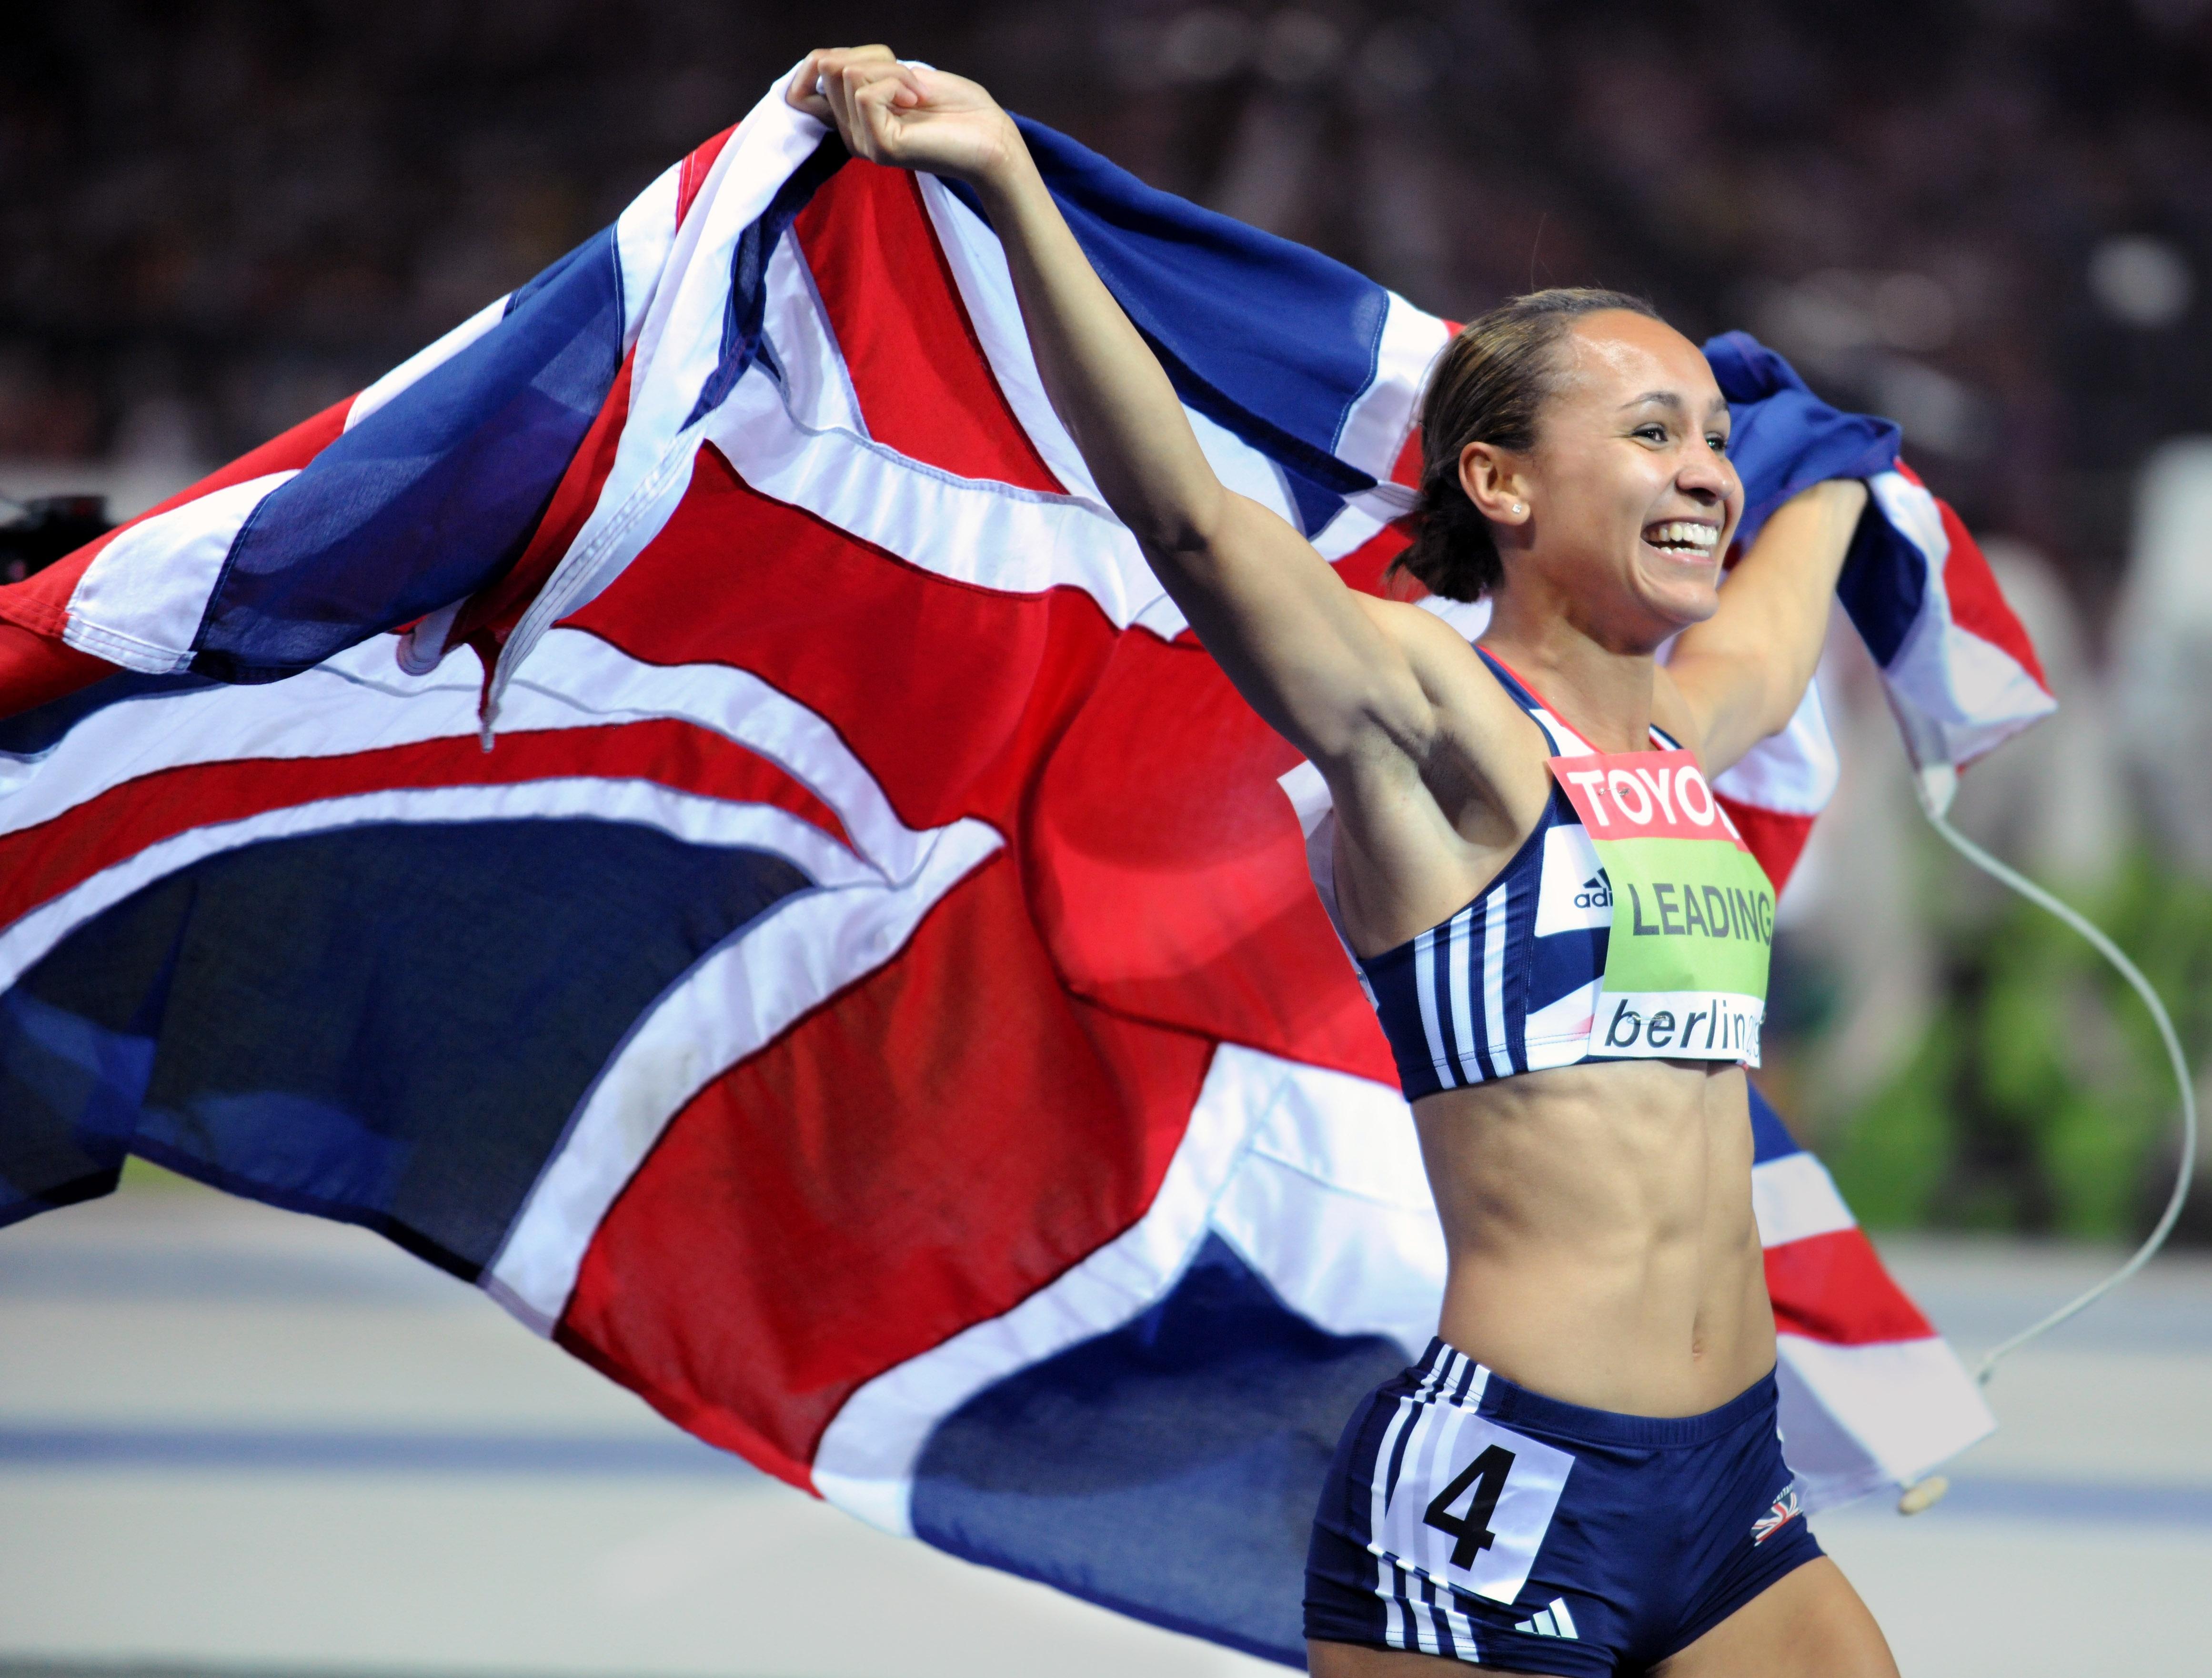 Women's Heptathlon Updates--2012 London Olympic Games